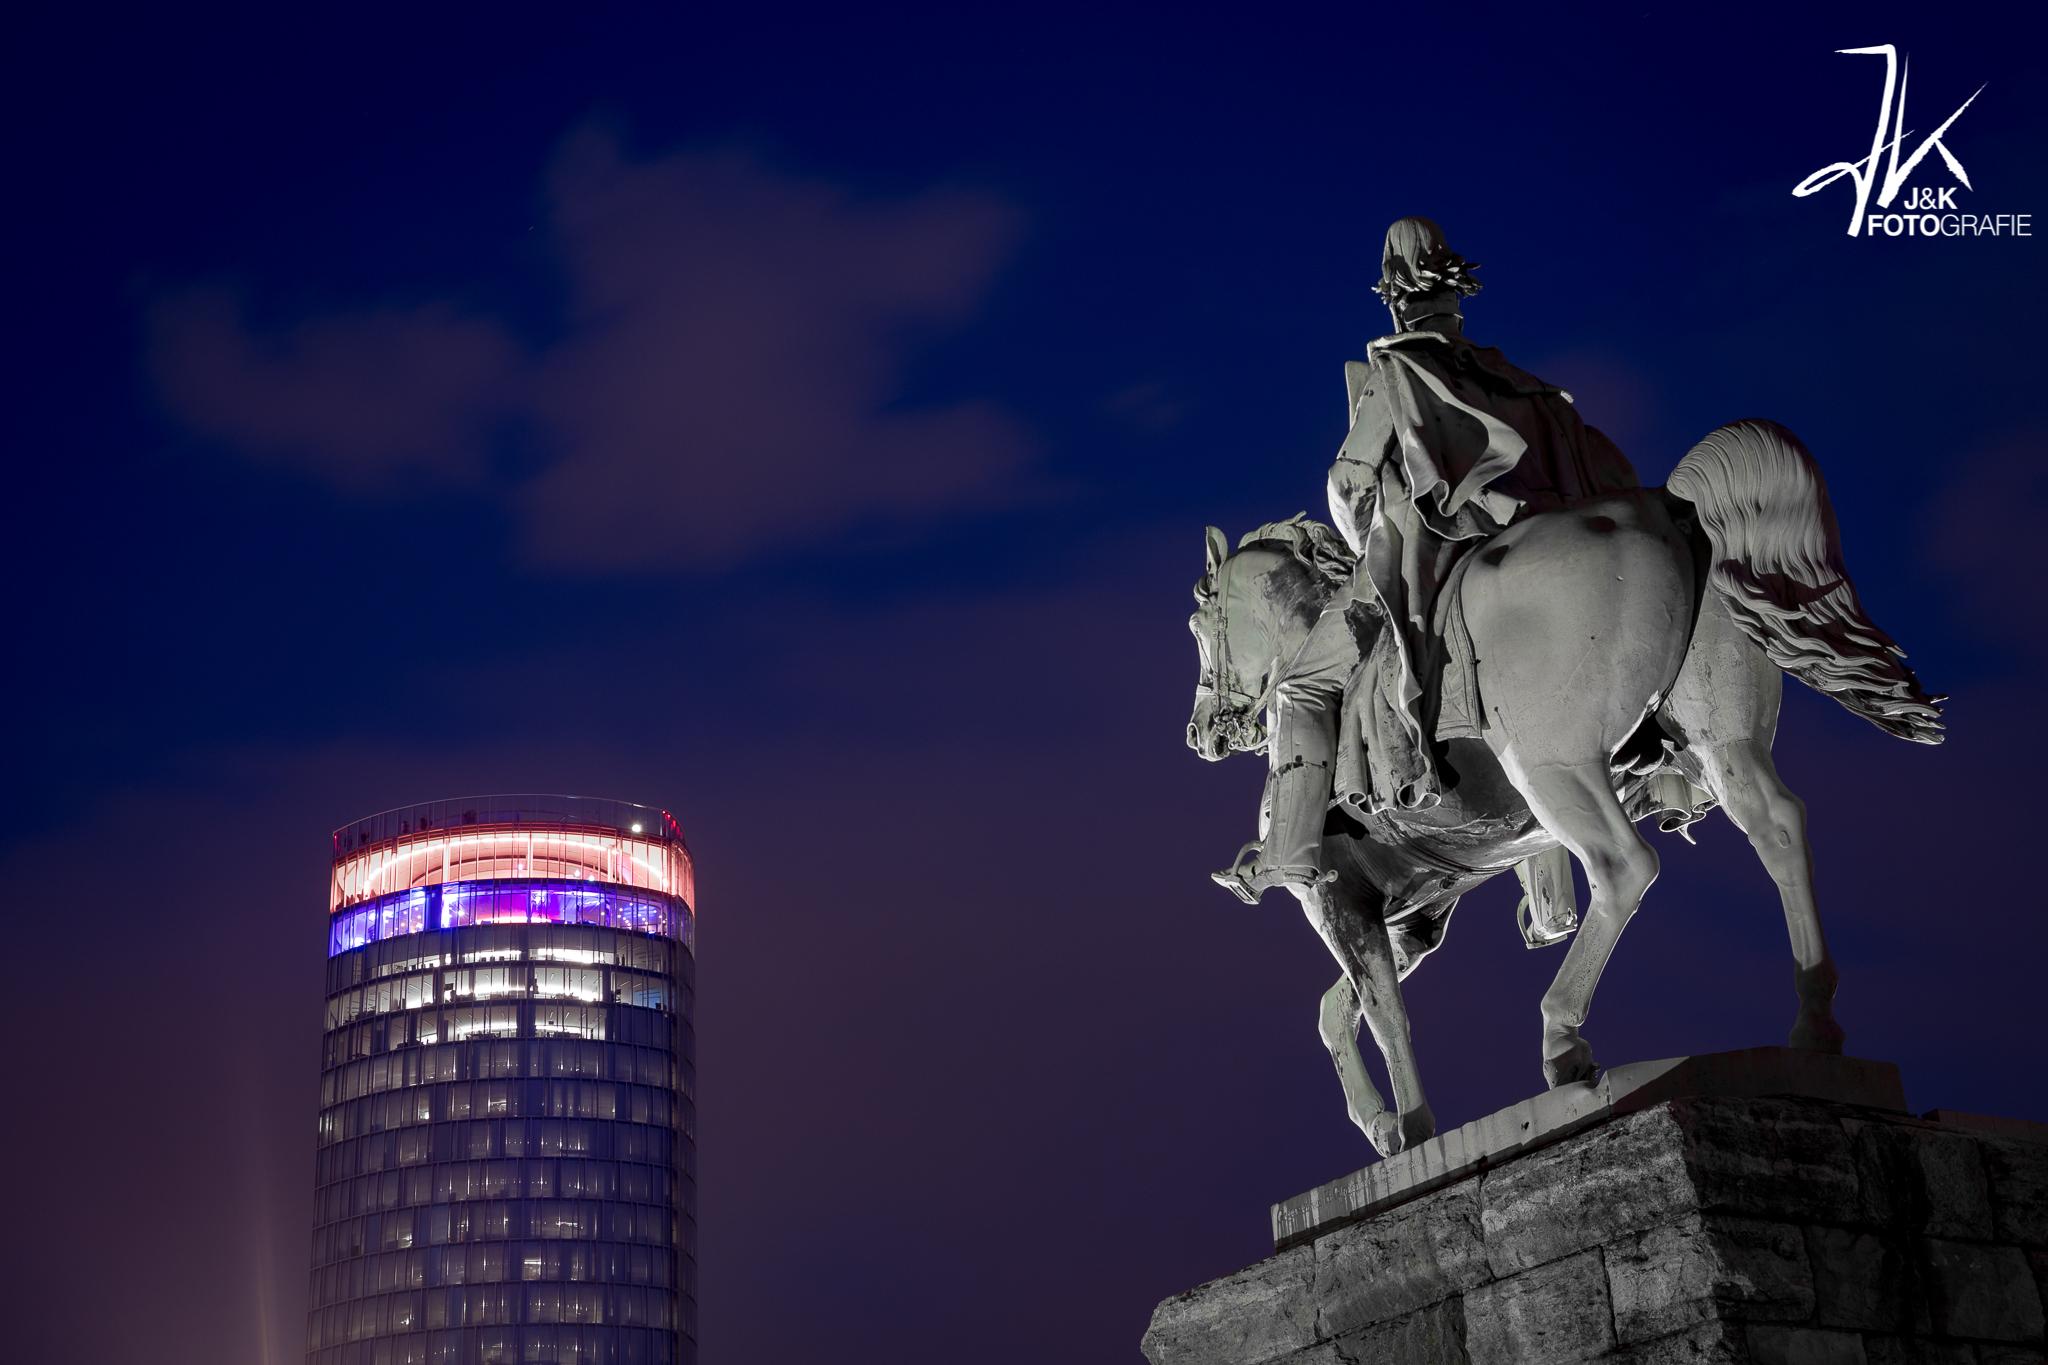 Kaiser Wilhelm Reiterstandbild, Köln, Germany